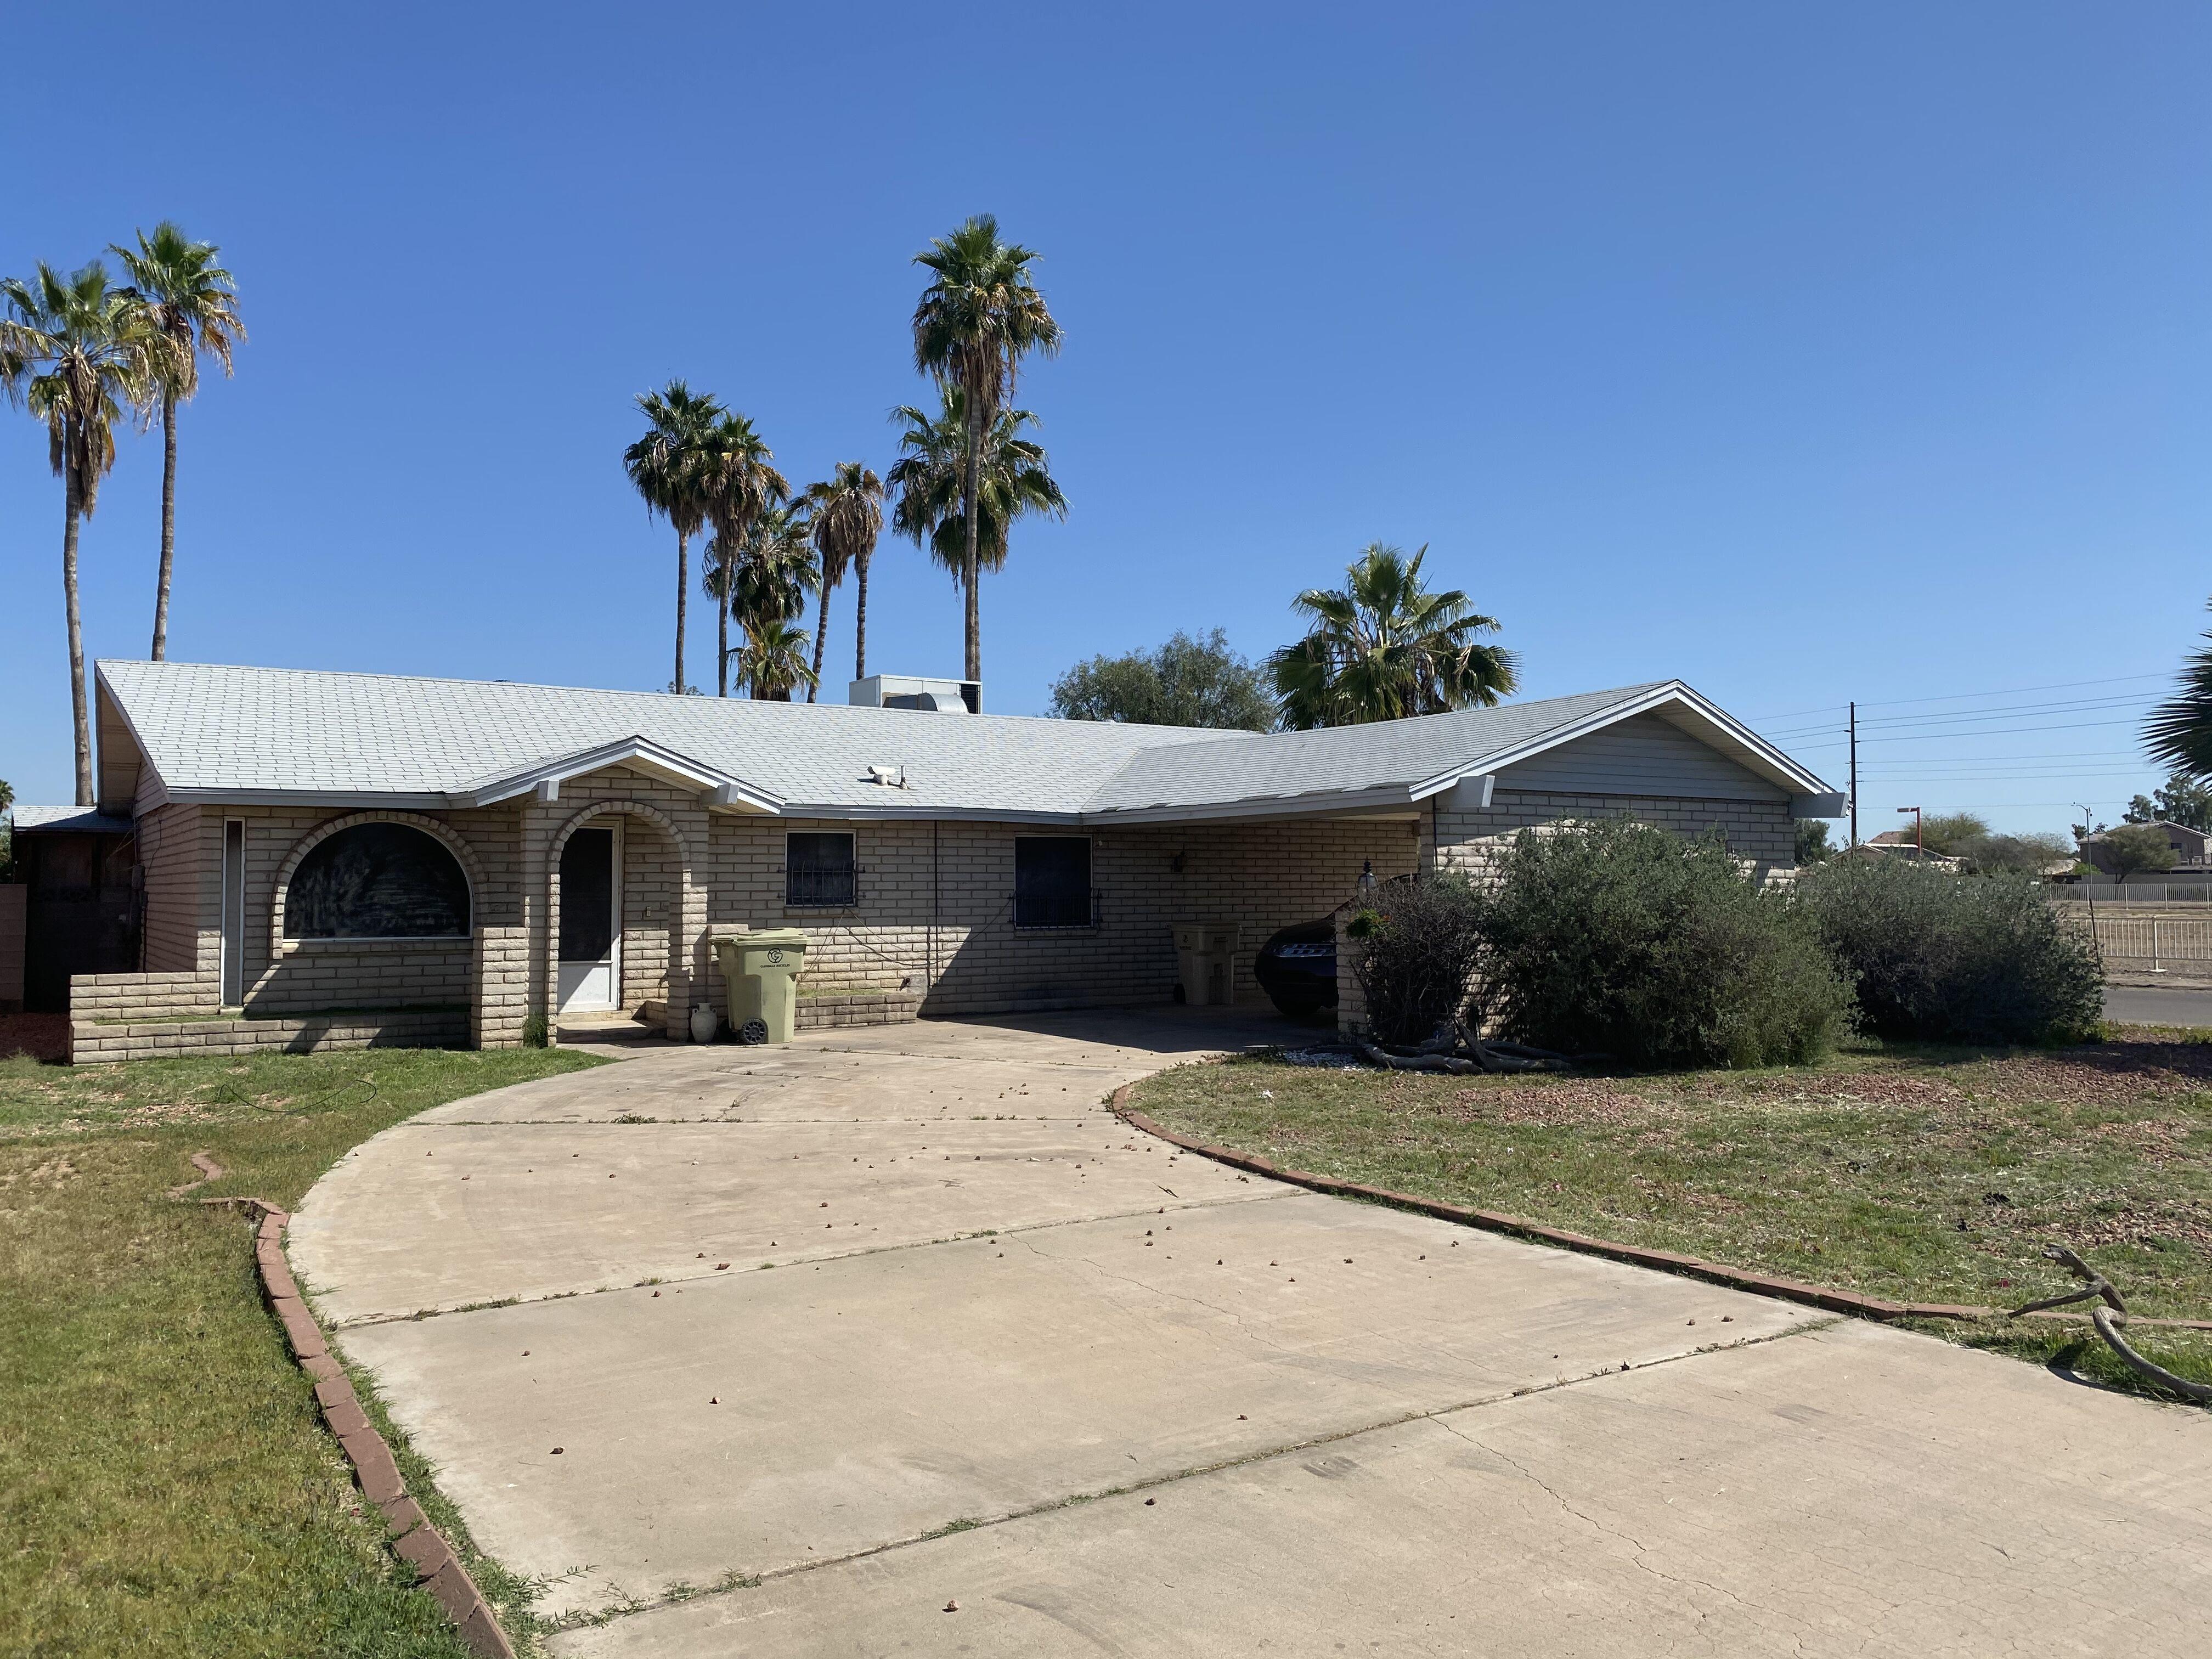 7132 W Bethany Home Rd Glendale, AZ 85303 wholesale home listing